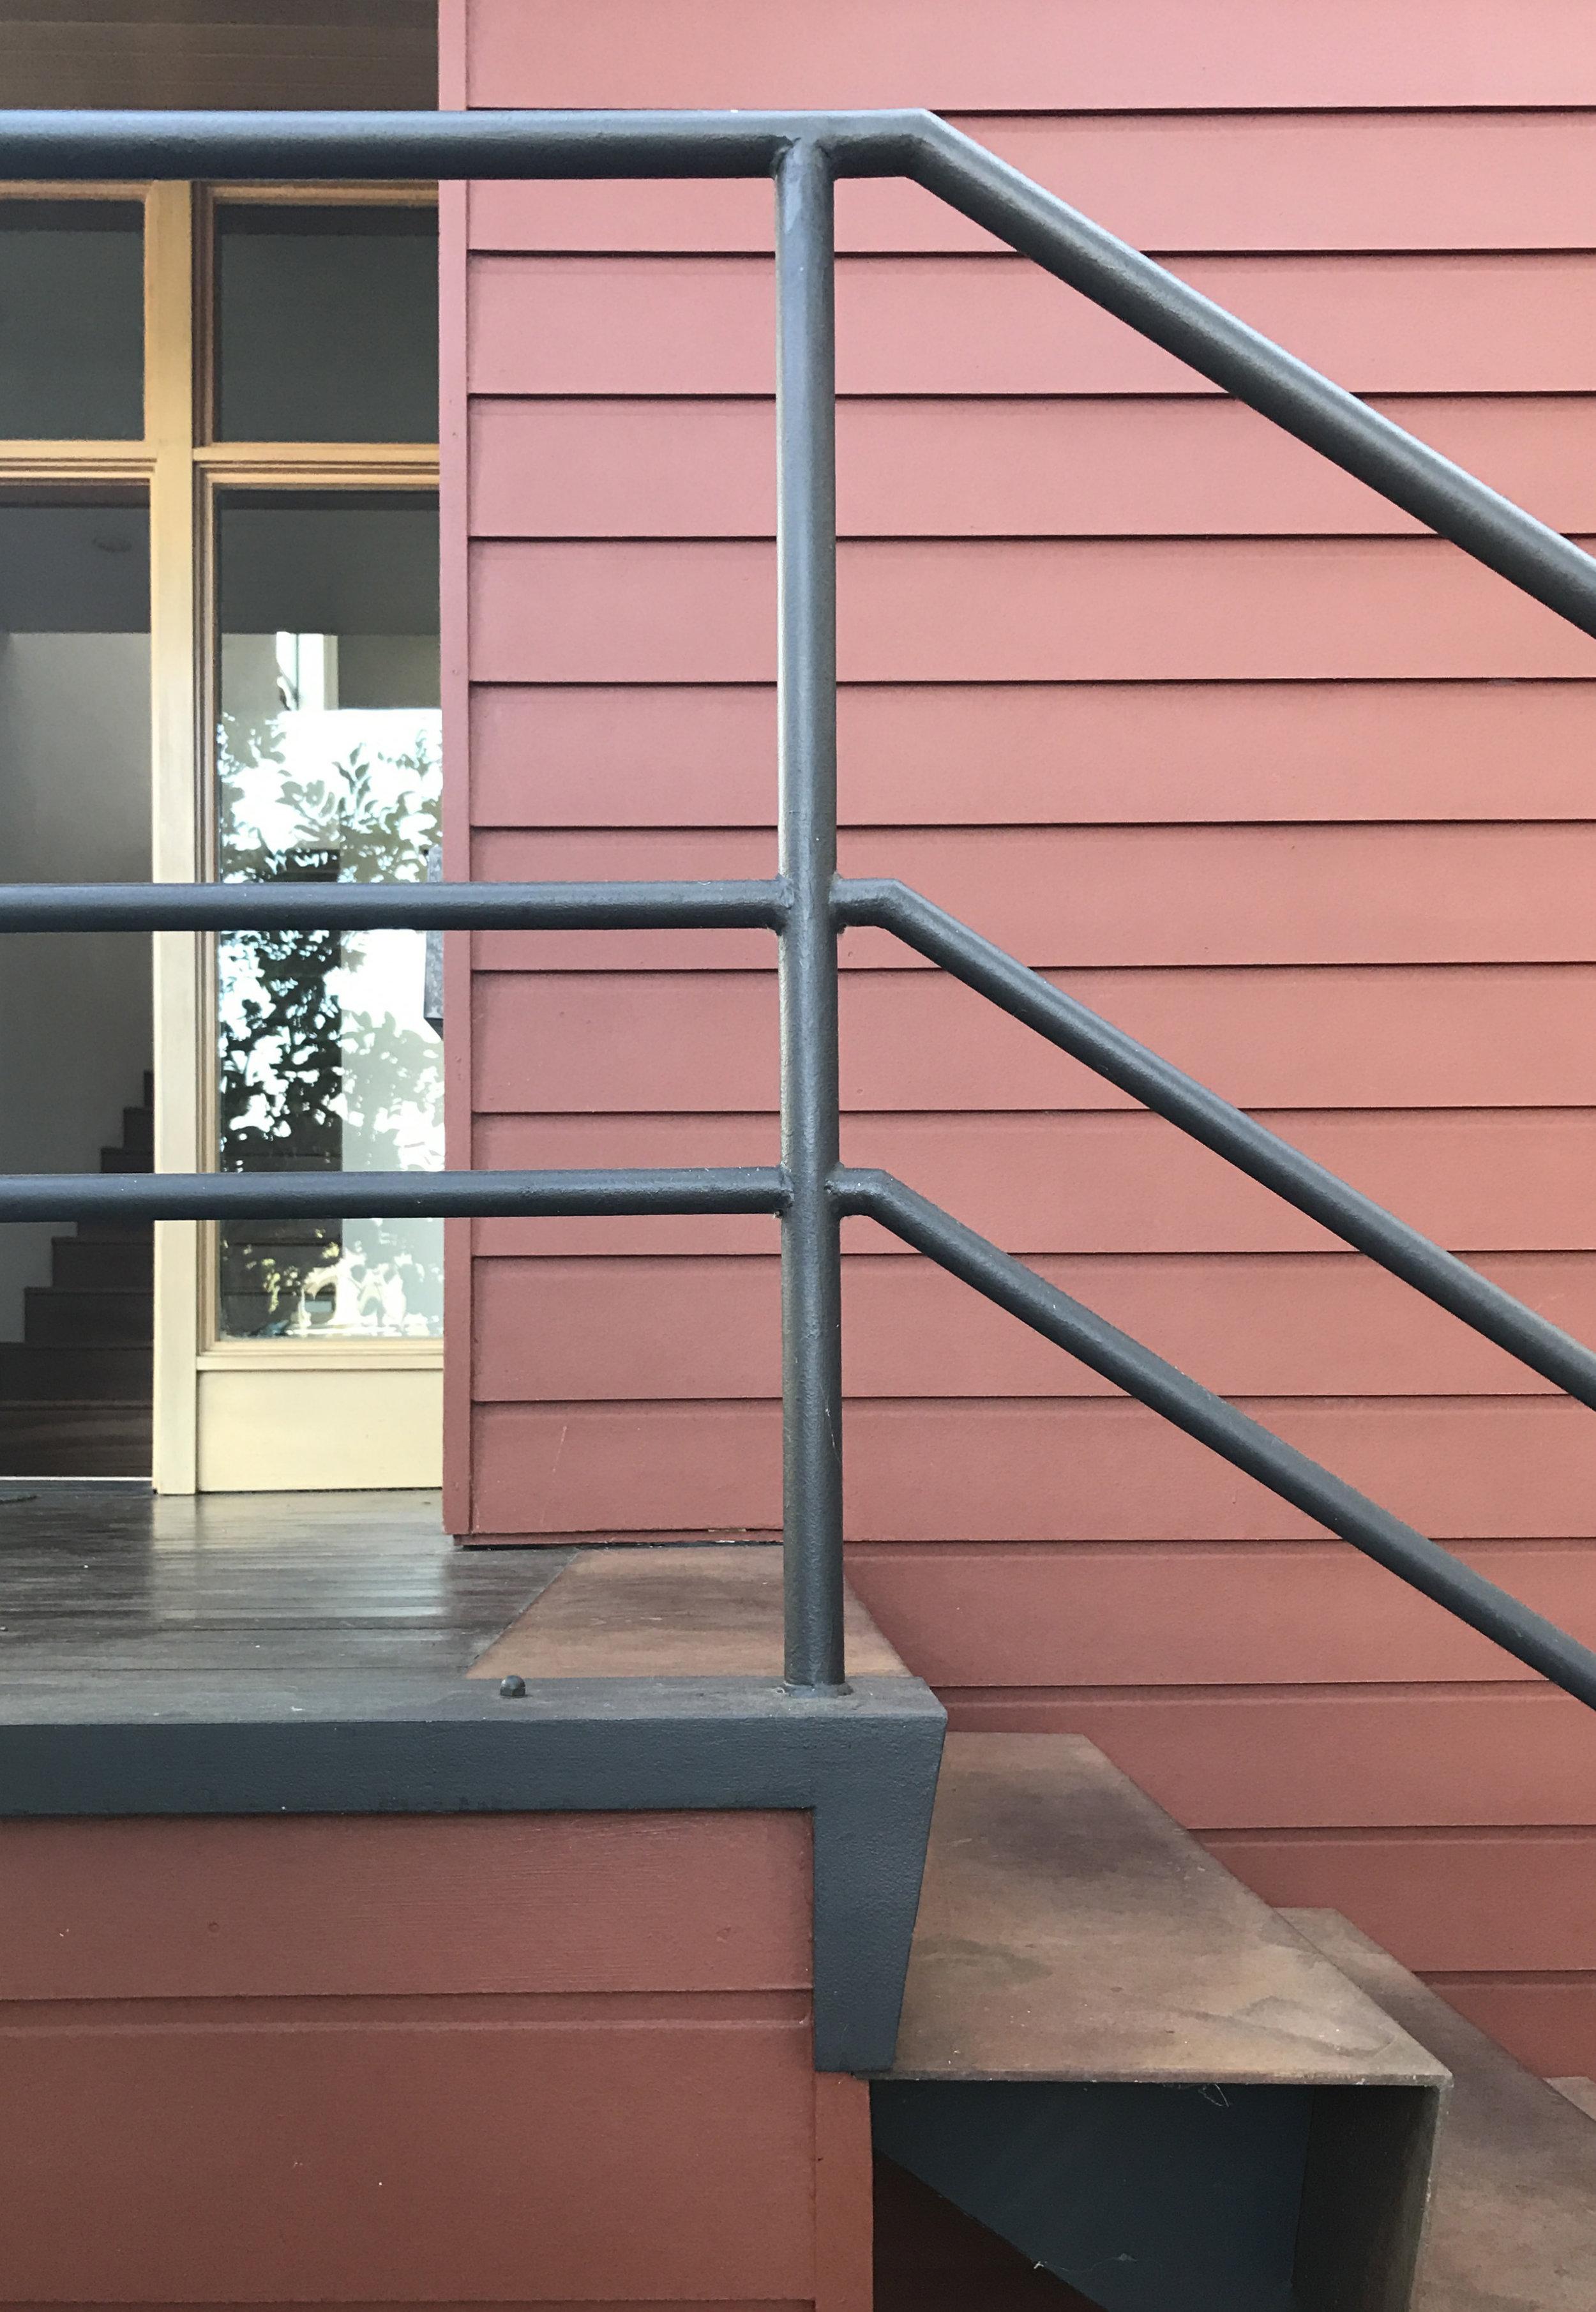 3518 stair handrail copy.jpg